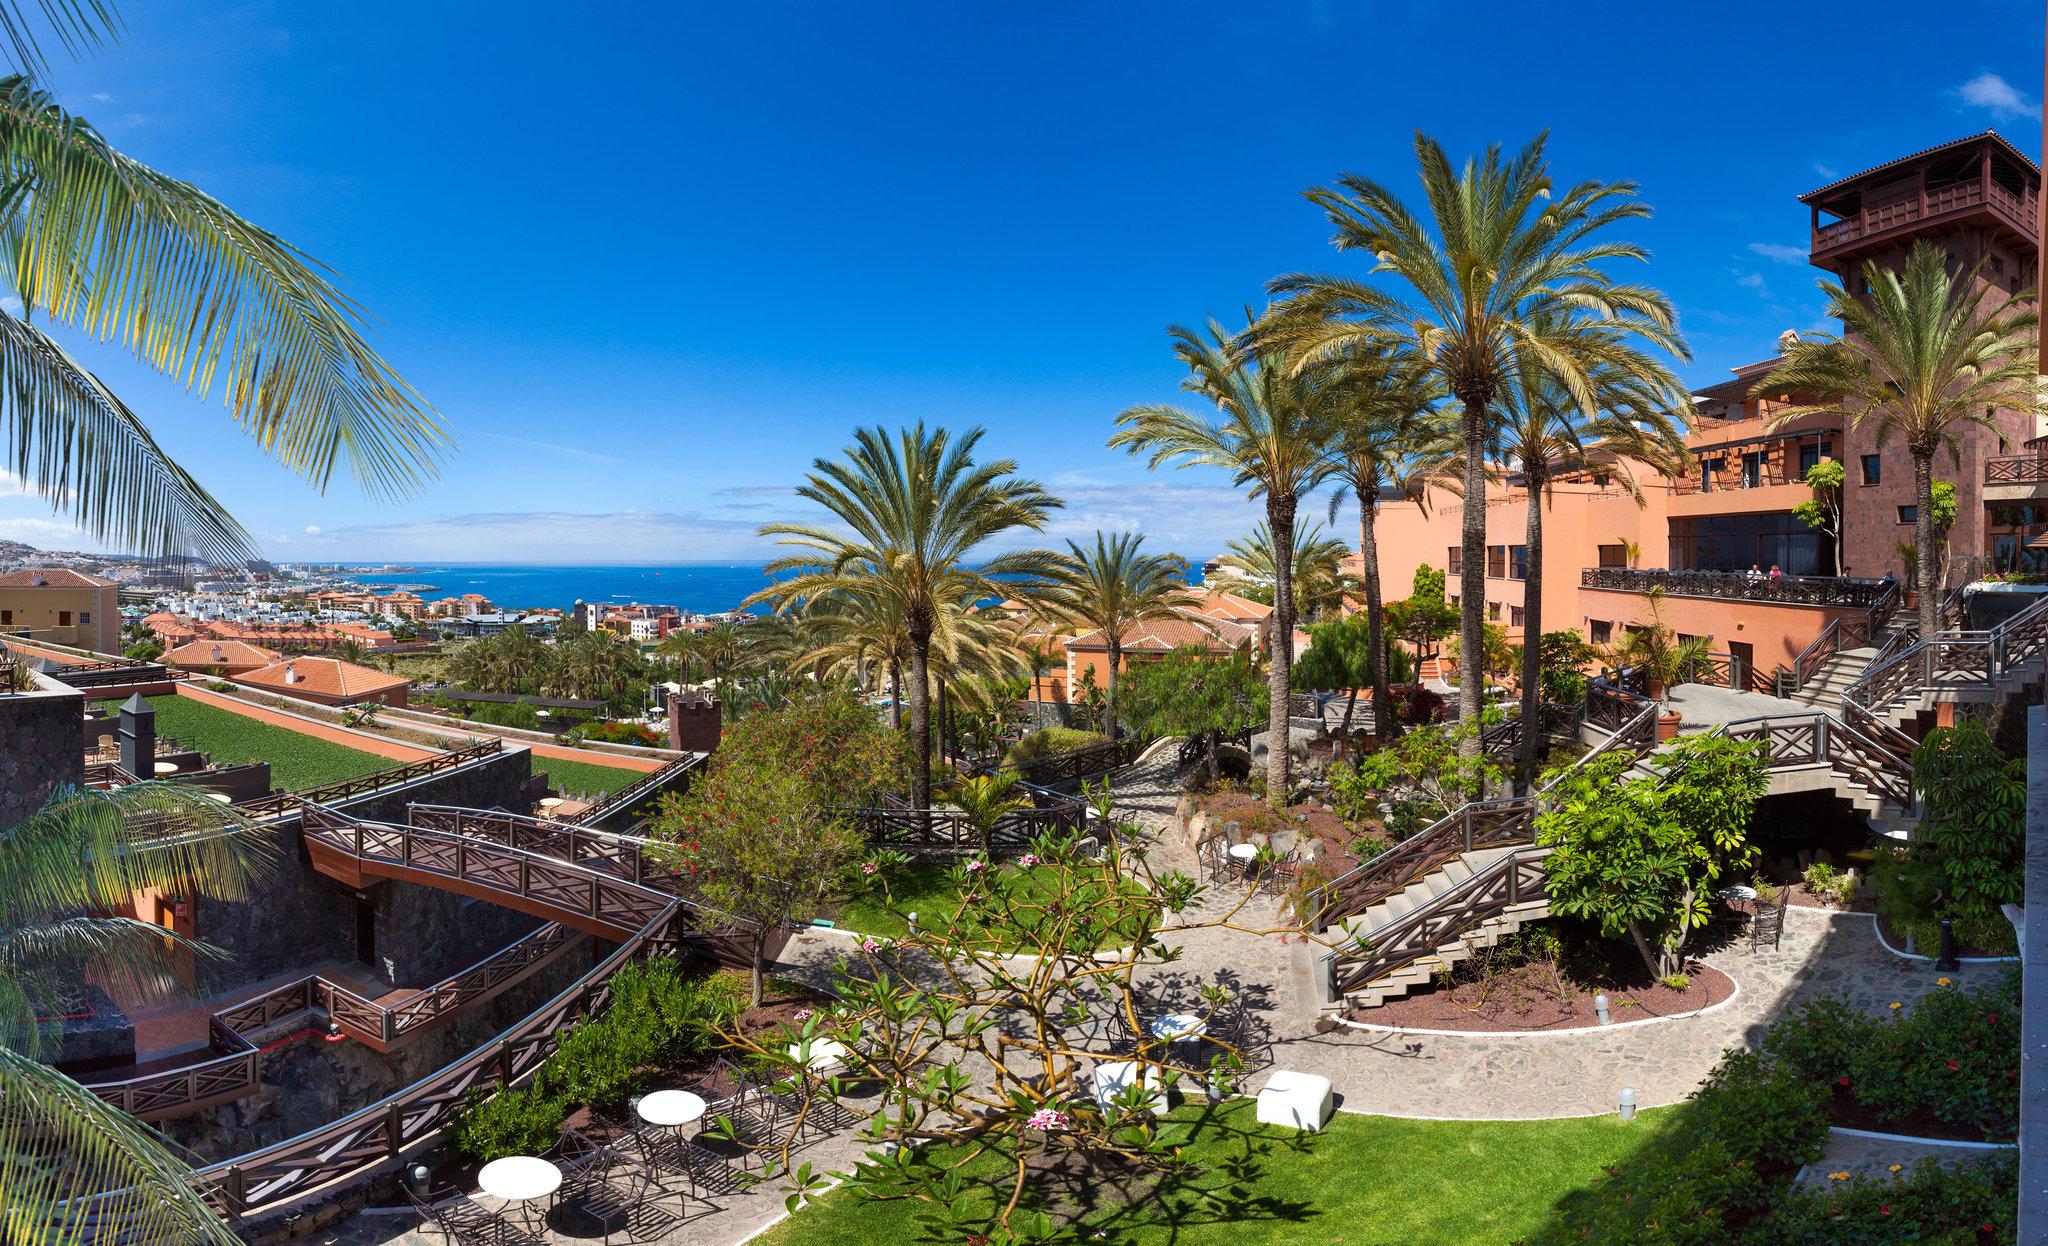 Meli Jardines del Teide en Costa Adeje Tenerife desde